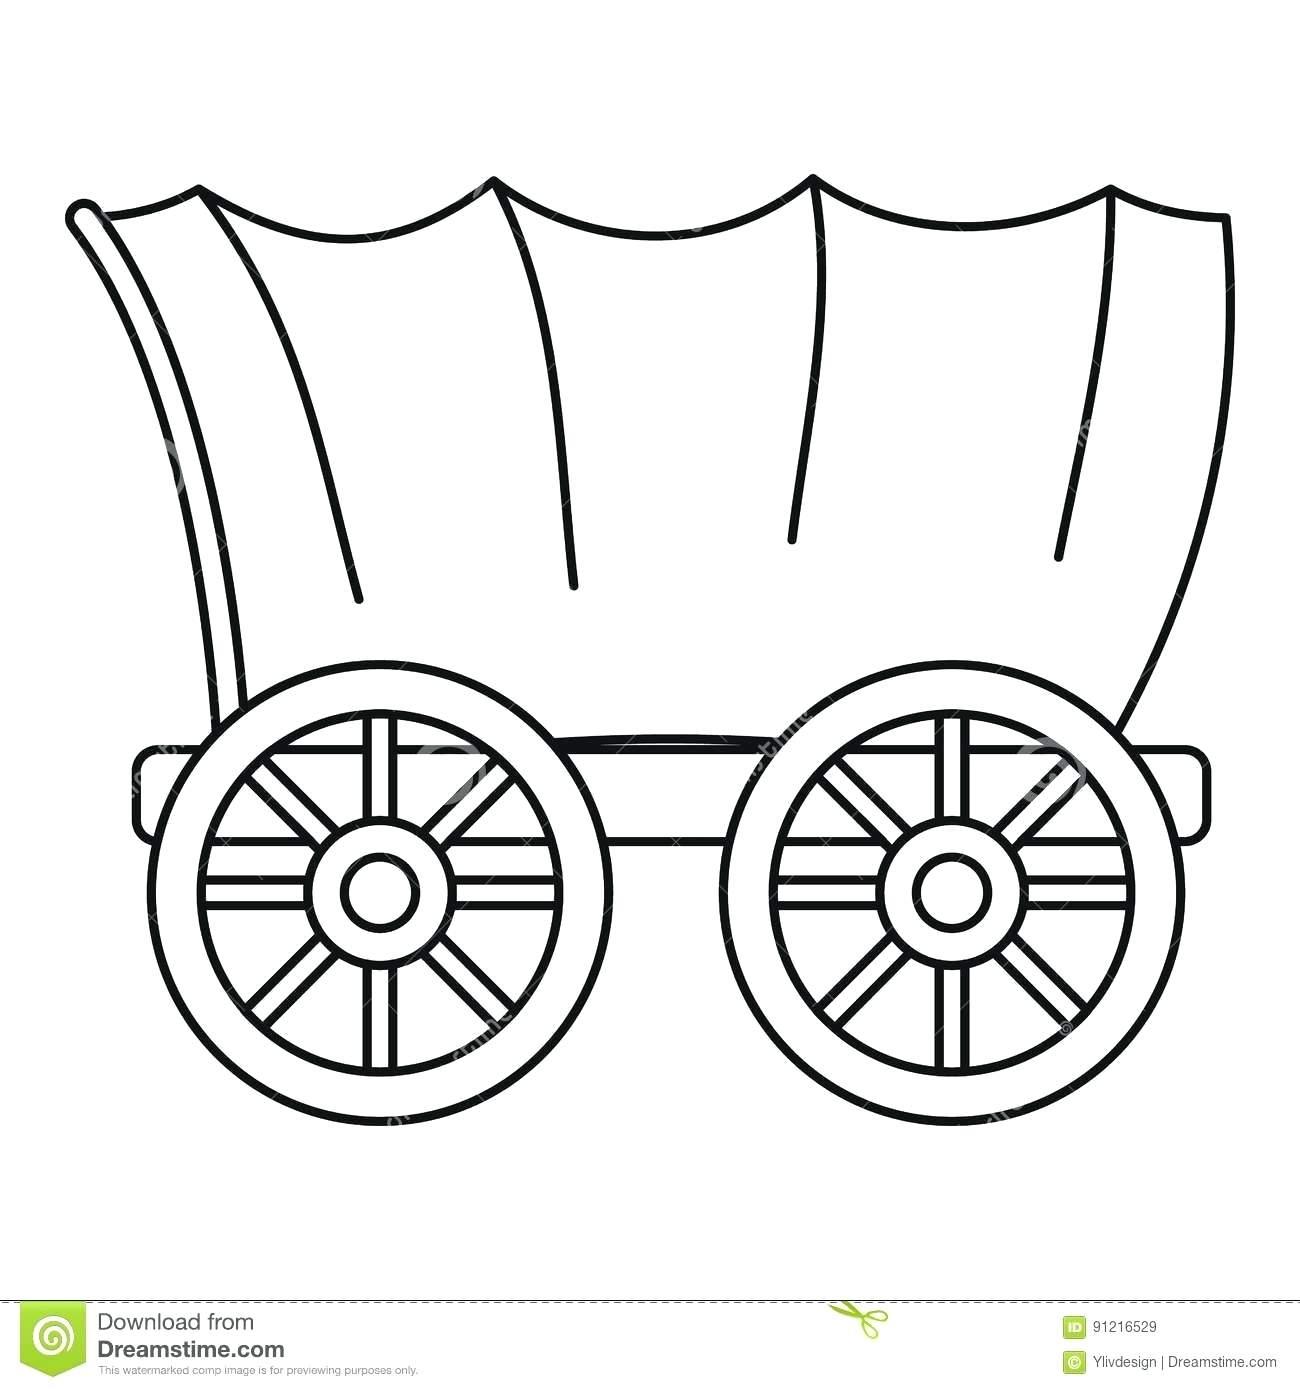 1527 Wagon free clipart.